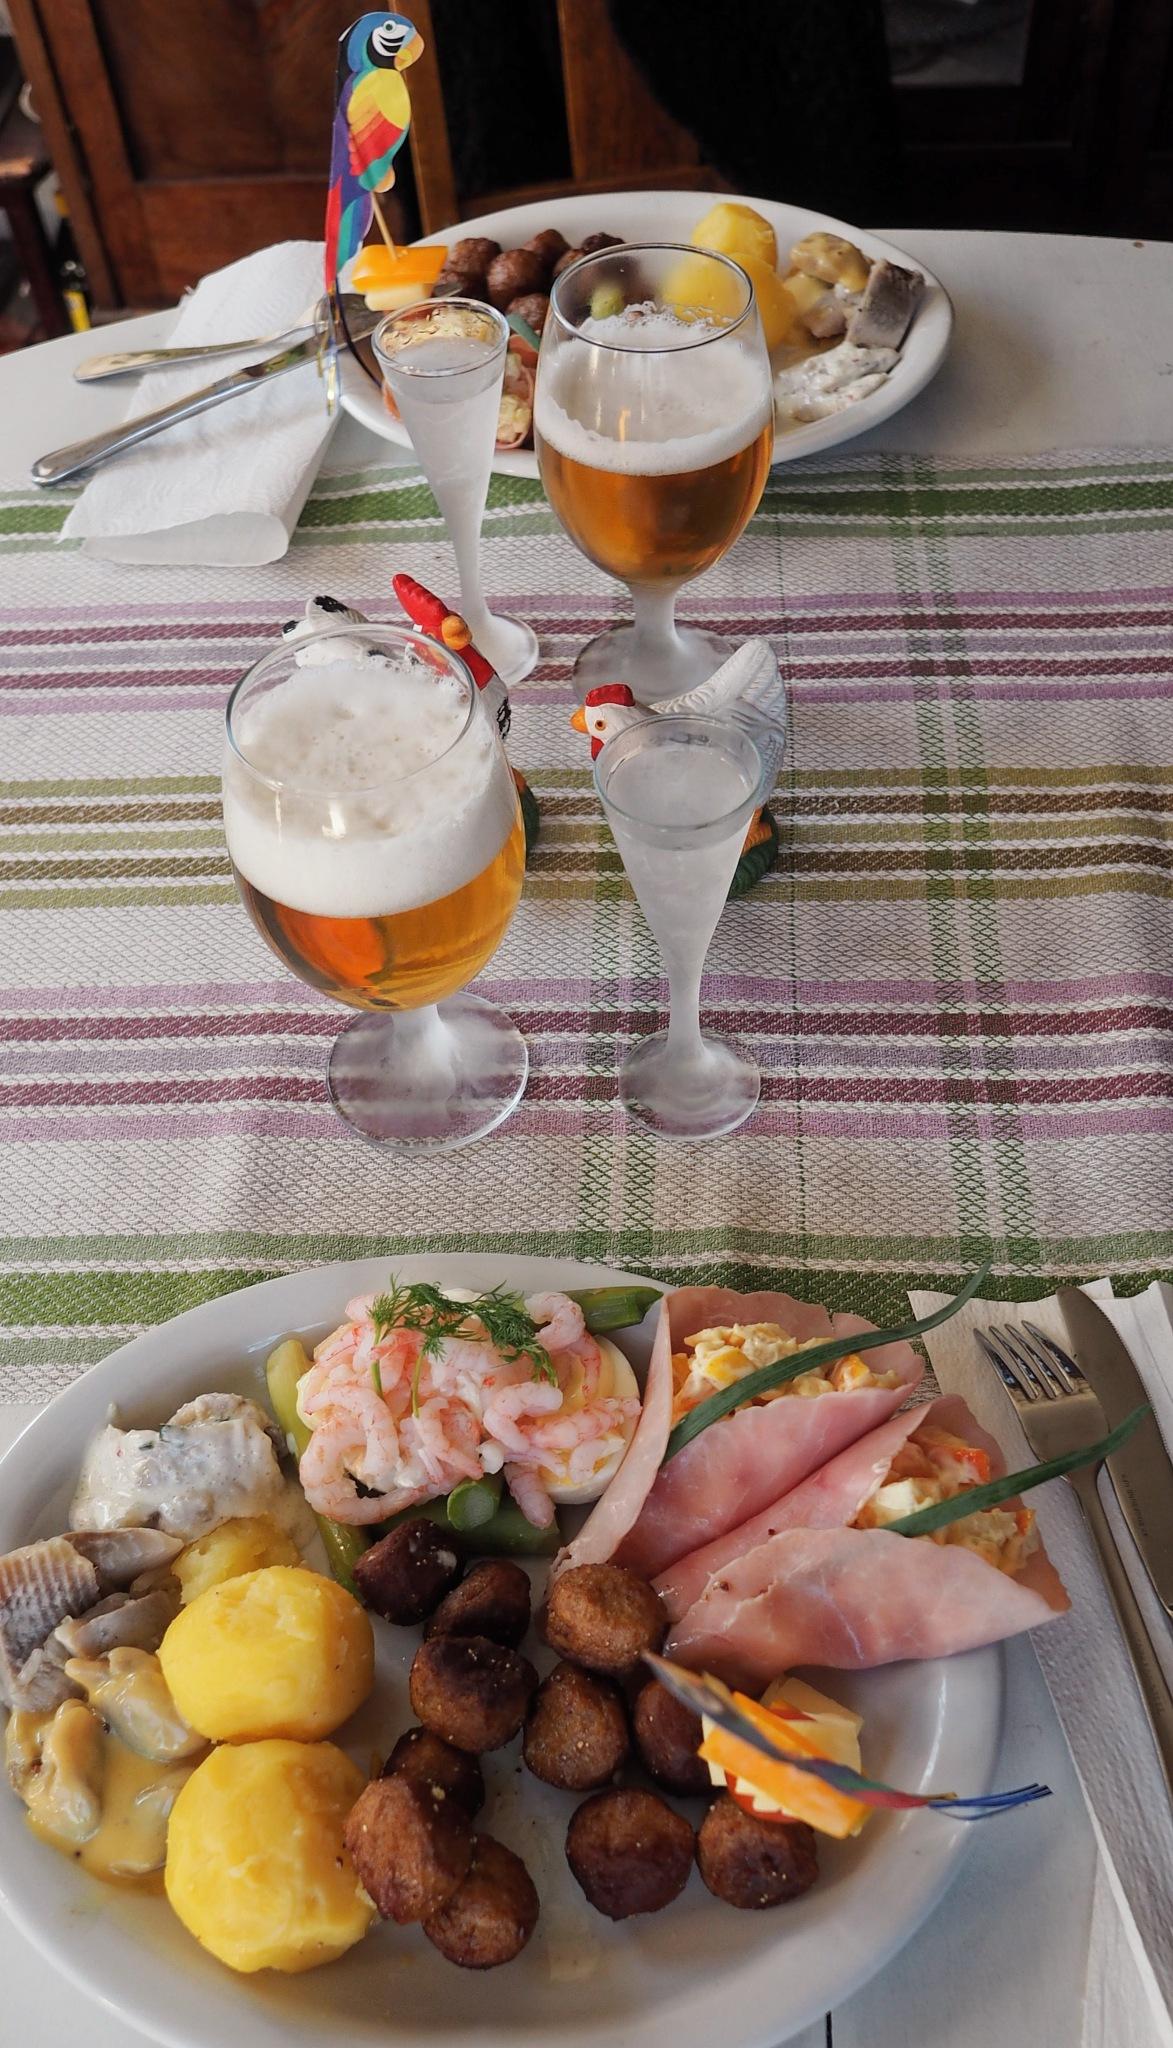 Swedish Easter Food by Ove Bogart Gunnarsson